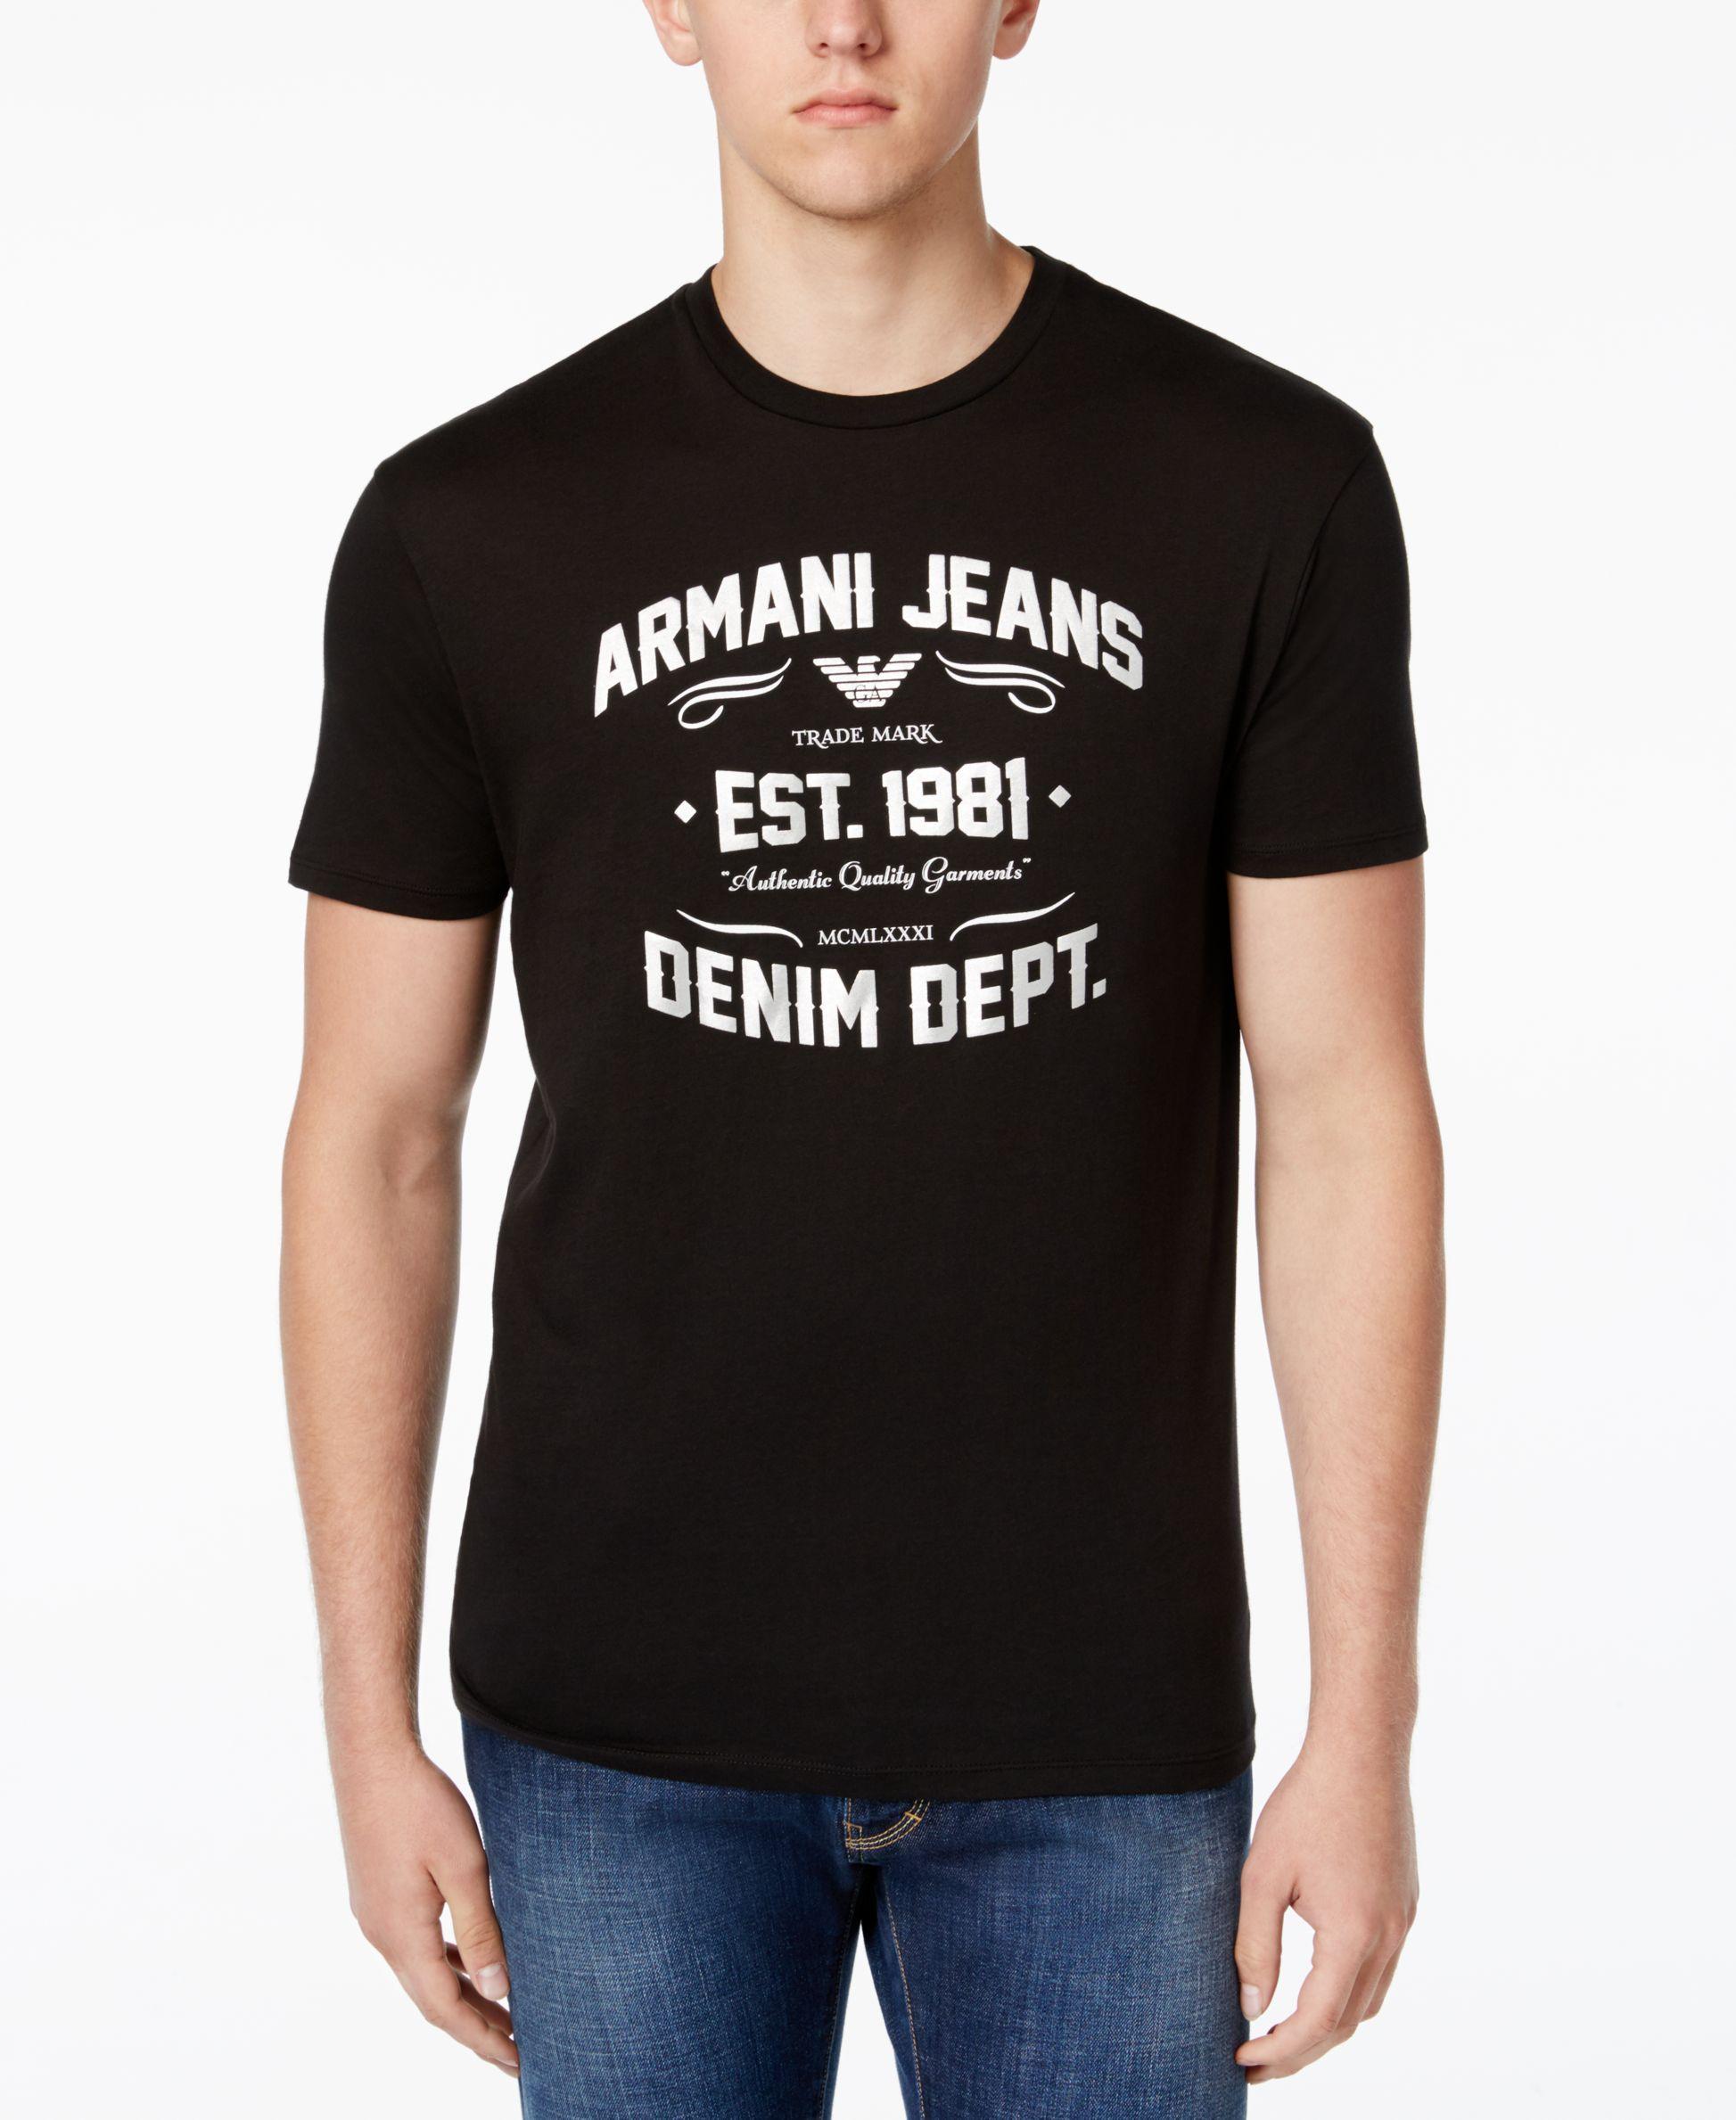 ed8fcdc866 Armani Jeans Men's Graphic-Print T-Shirt | Me2 | Armani jeans men ...